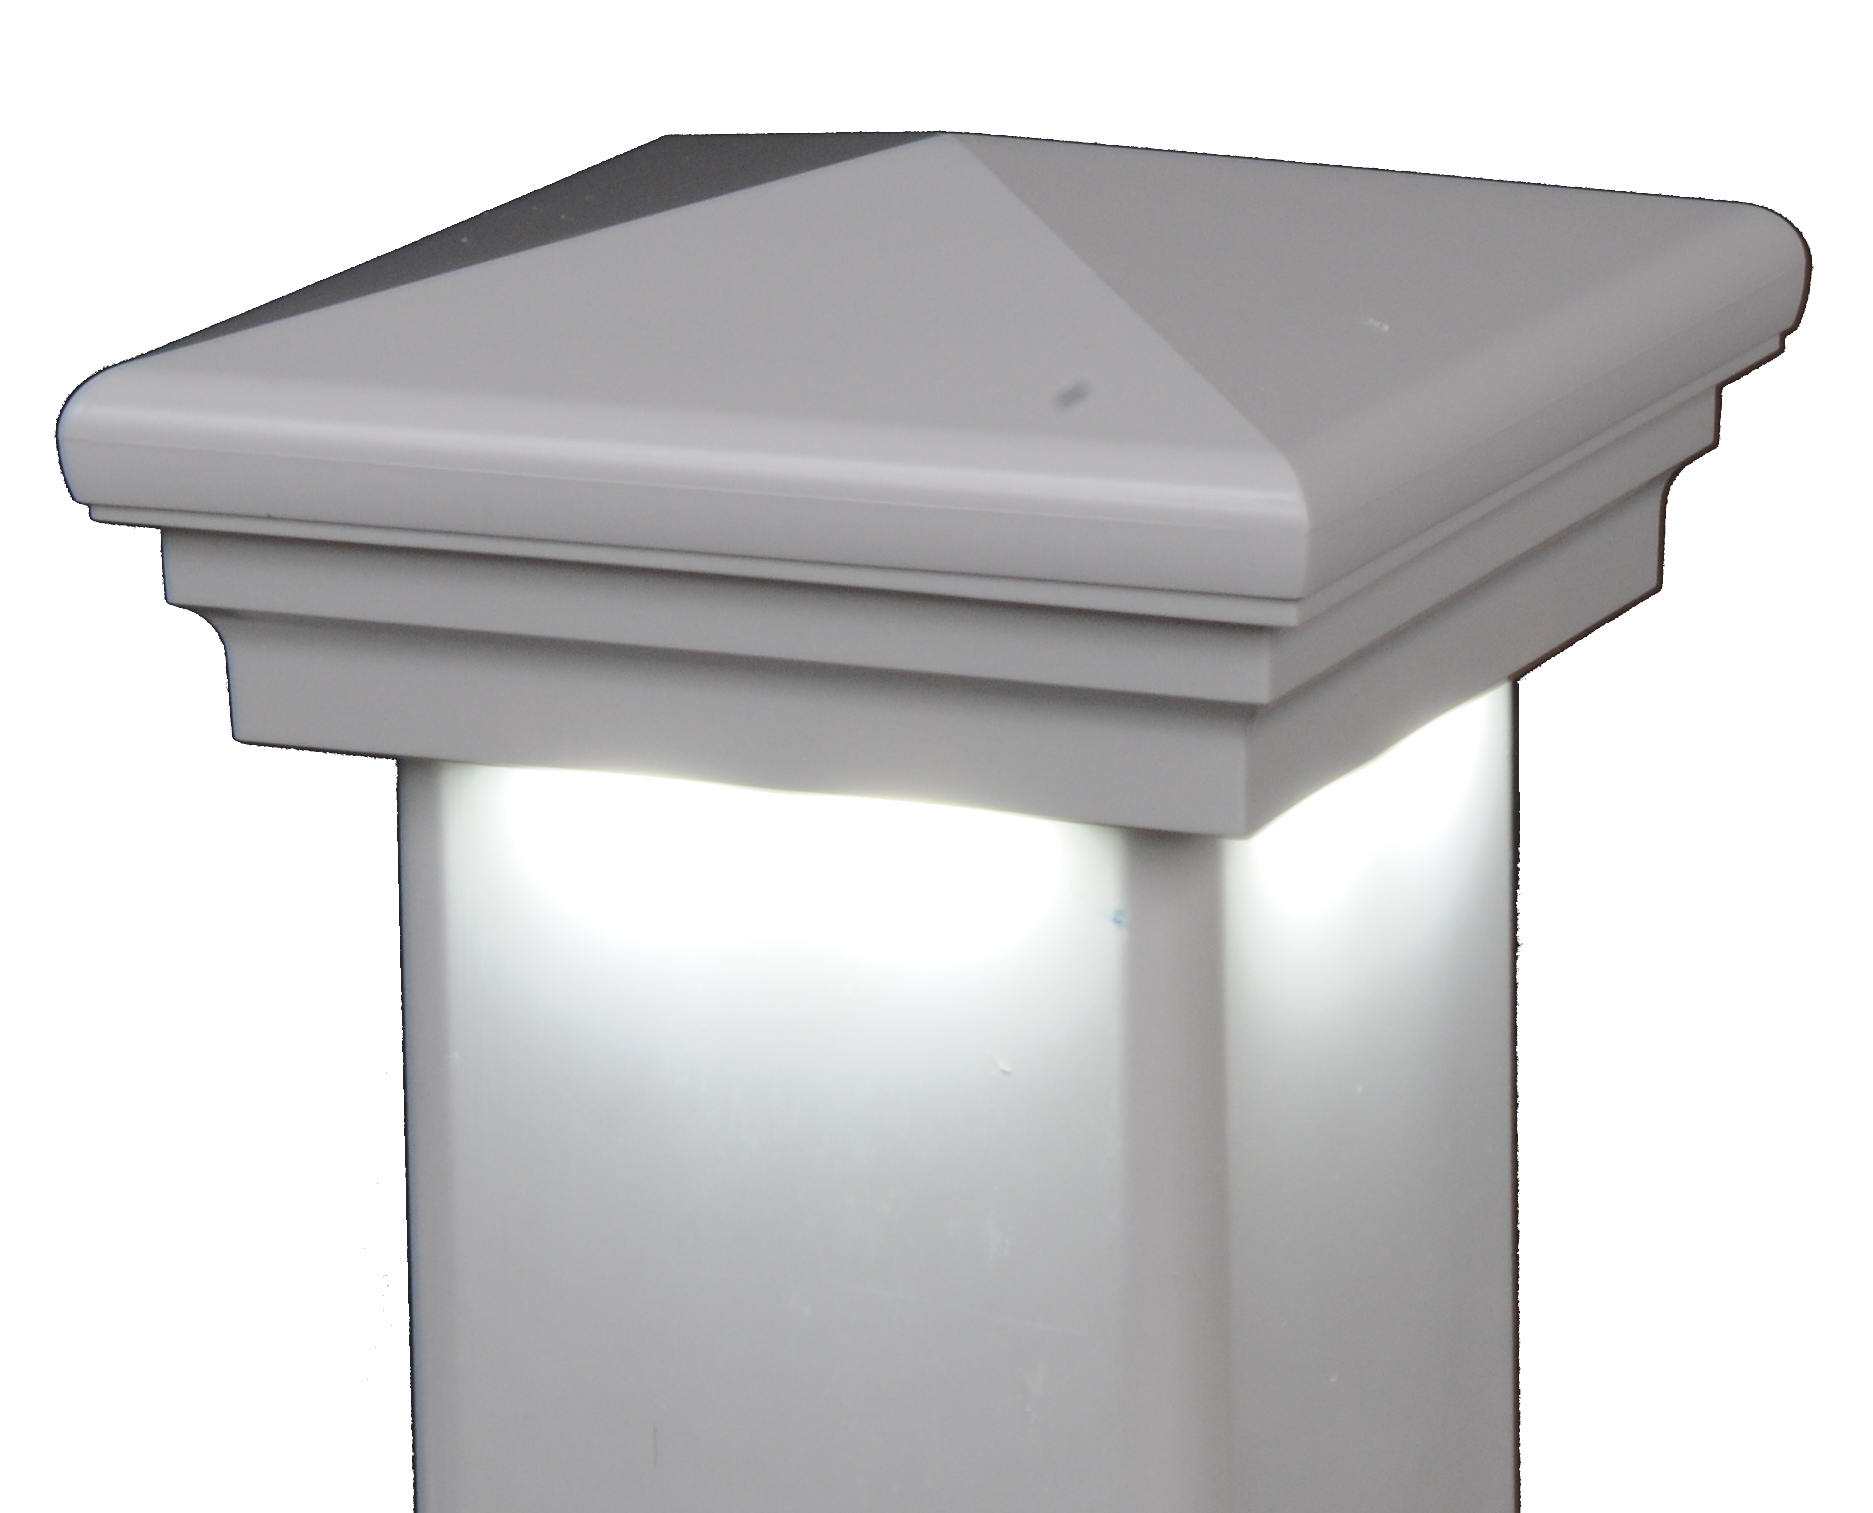 Neptune Downward low voltage hard wired vinyl post cap lighting light LMT solar